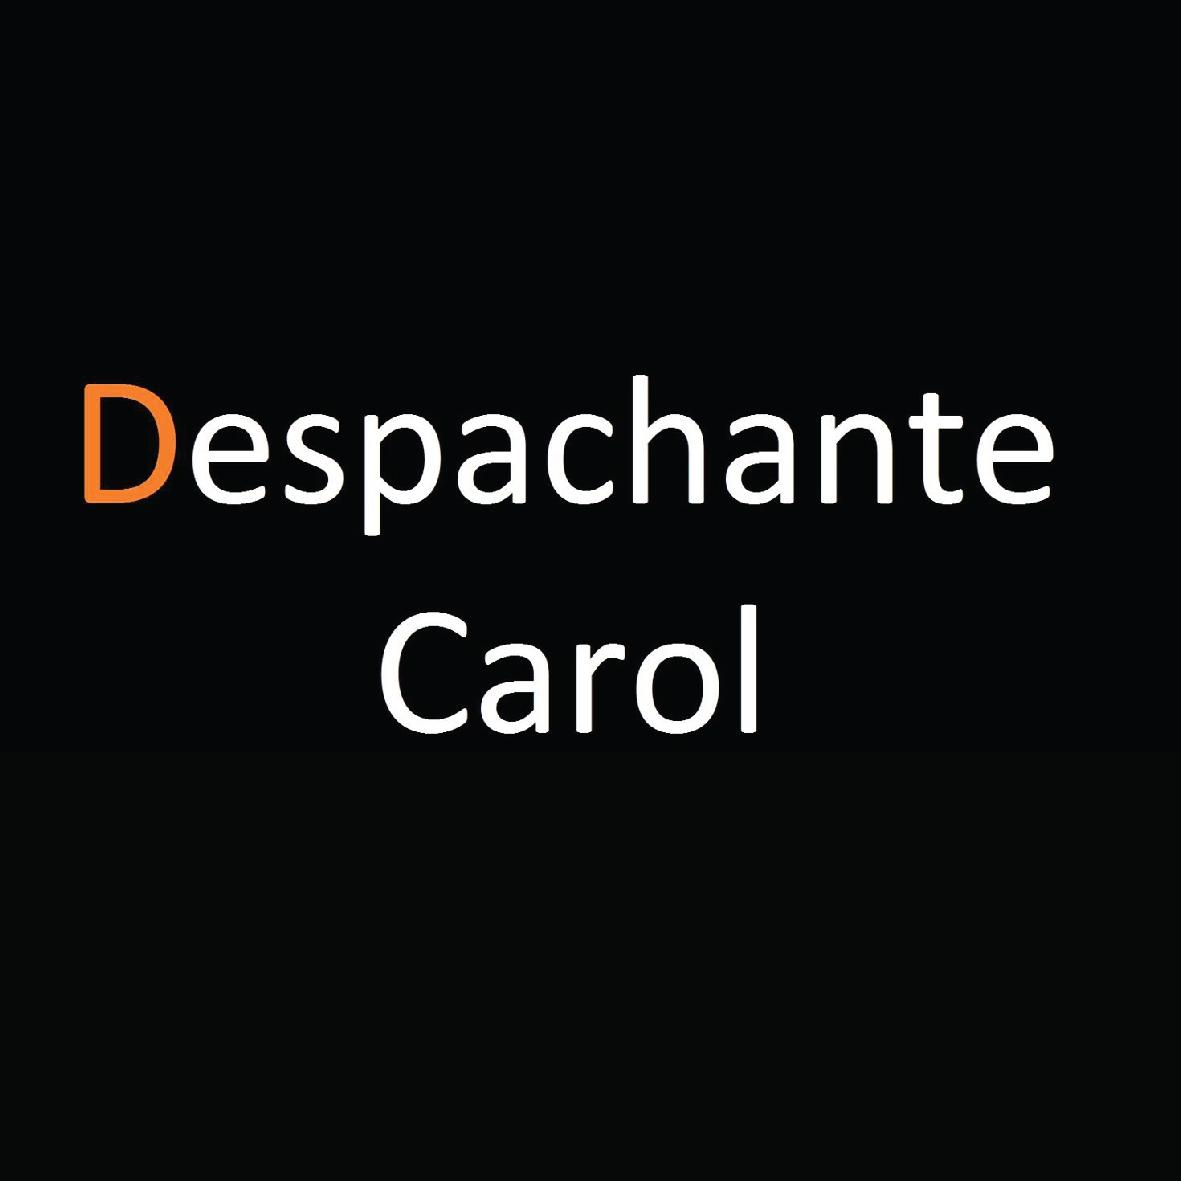 Despachante Carol